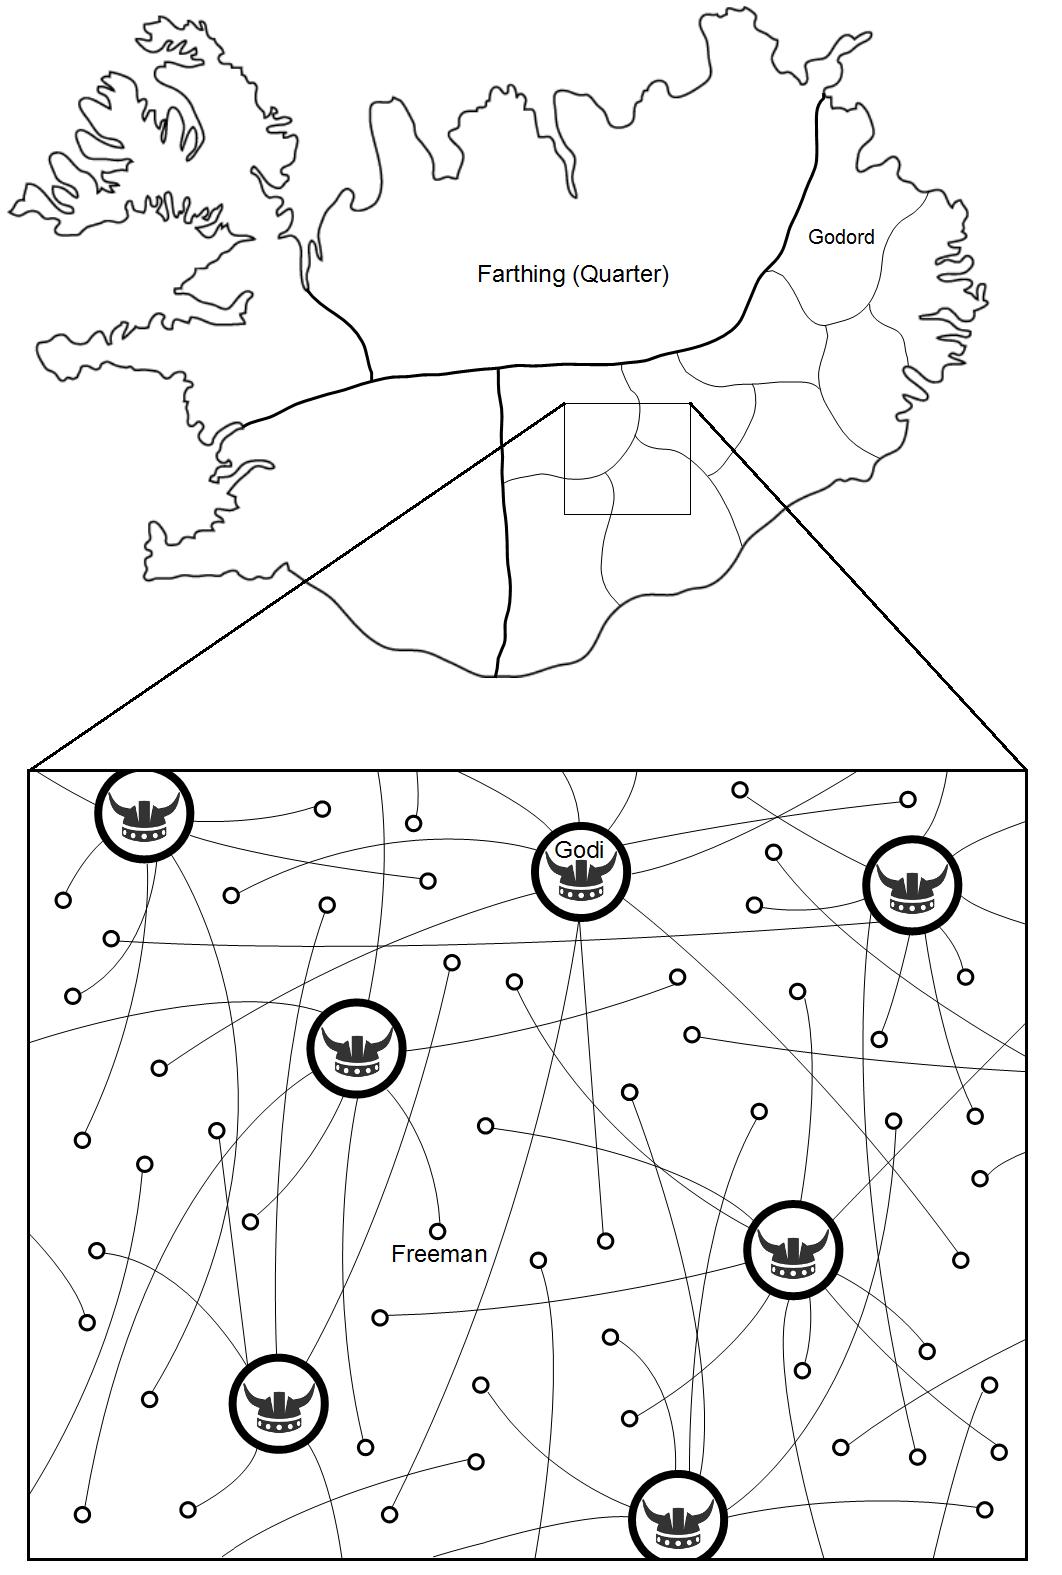 Iceland_Final